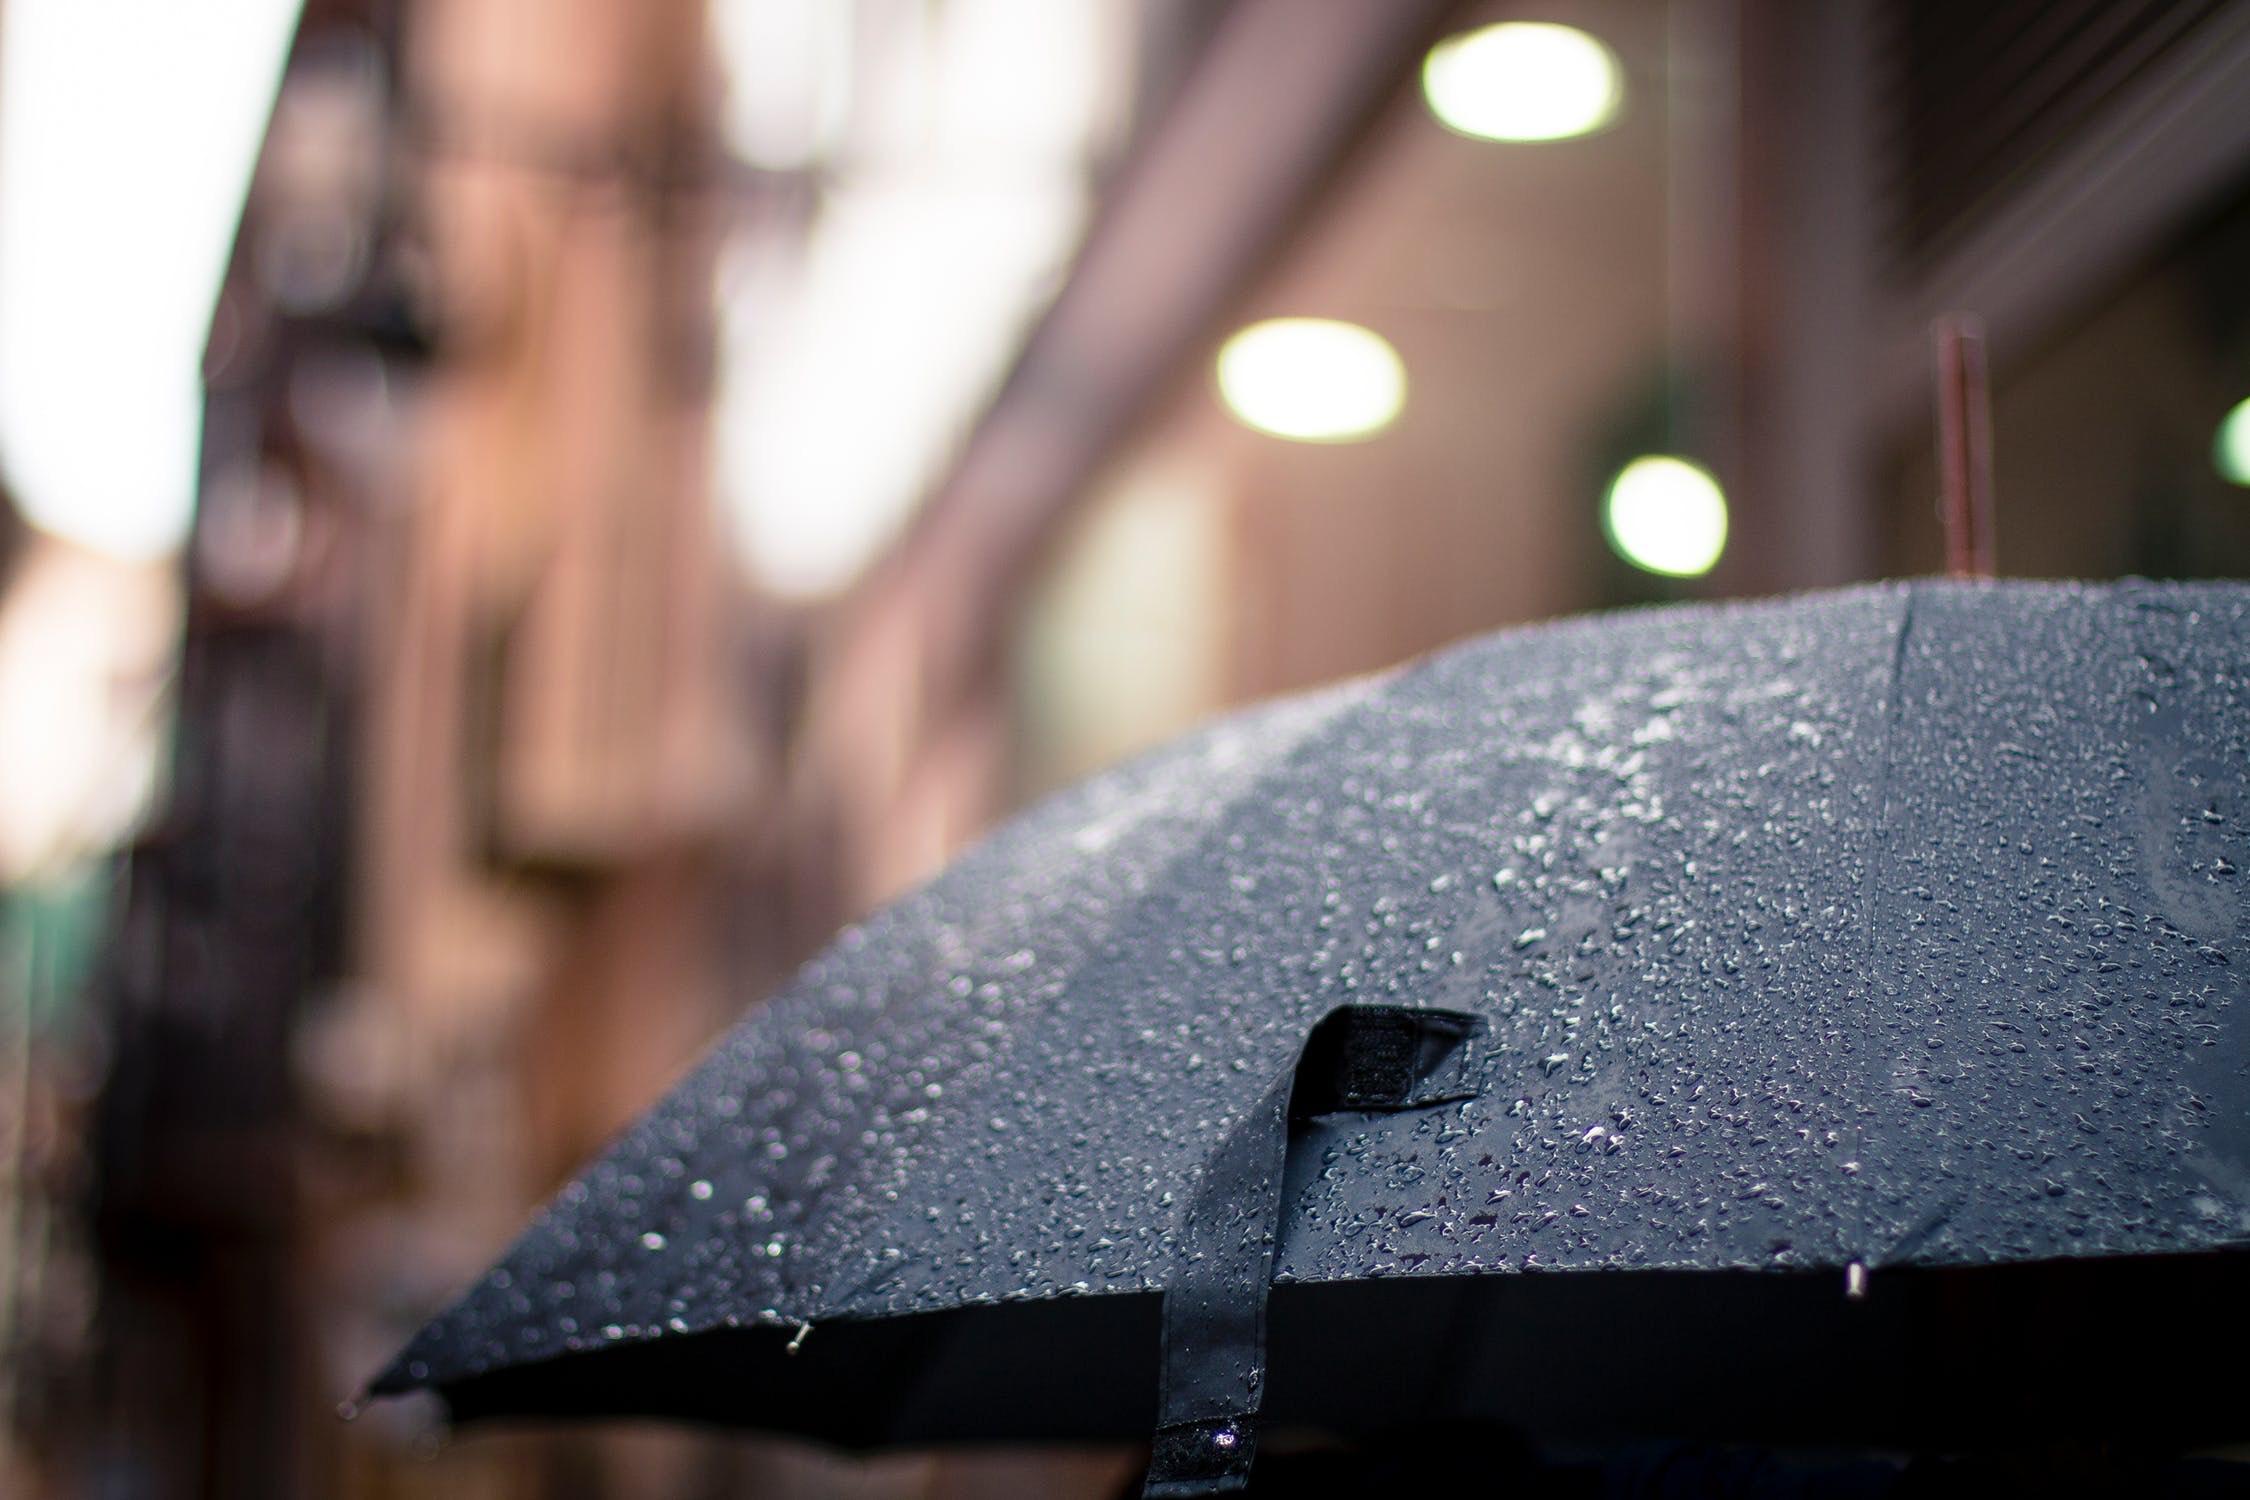 Meteo Ottobre 2019: tra piogge sparse, nubi e ottobrate soleggiate